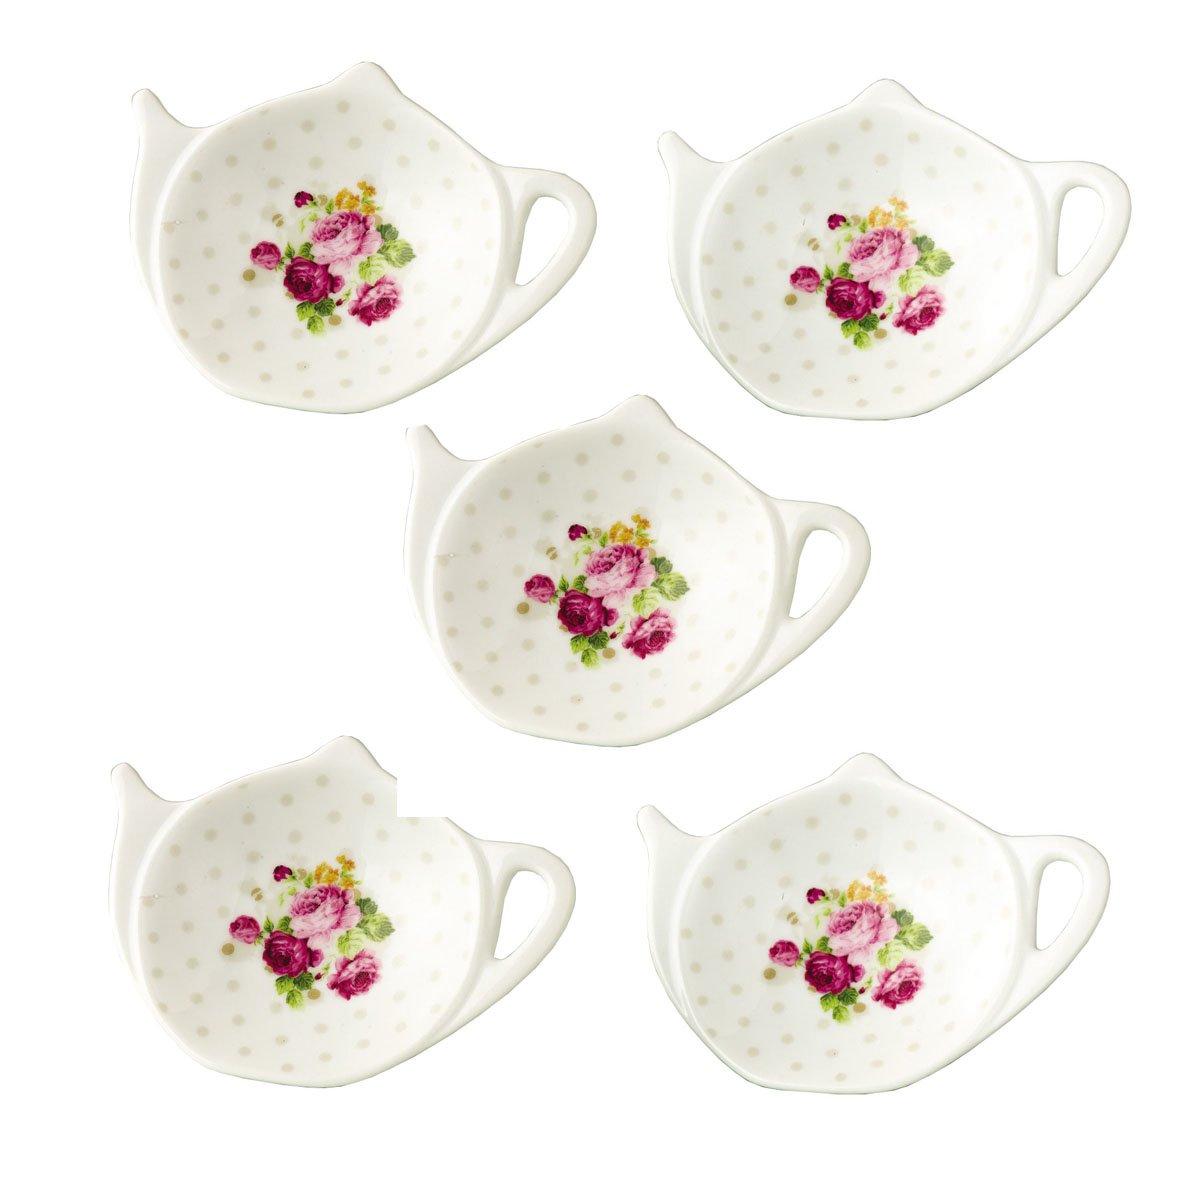 White Porcelain Ceramic Set with Flower Trim Teapot-Shaped Tea Bag Holder Tea Bag Coasters, Spoon Rests; Classic Tea Saucer Seasoning Dish Set (XQX)